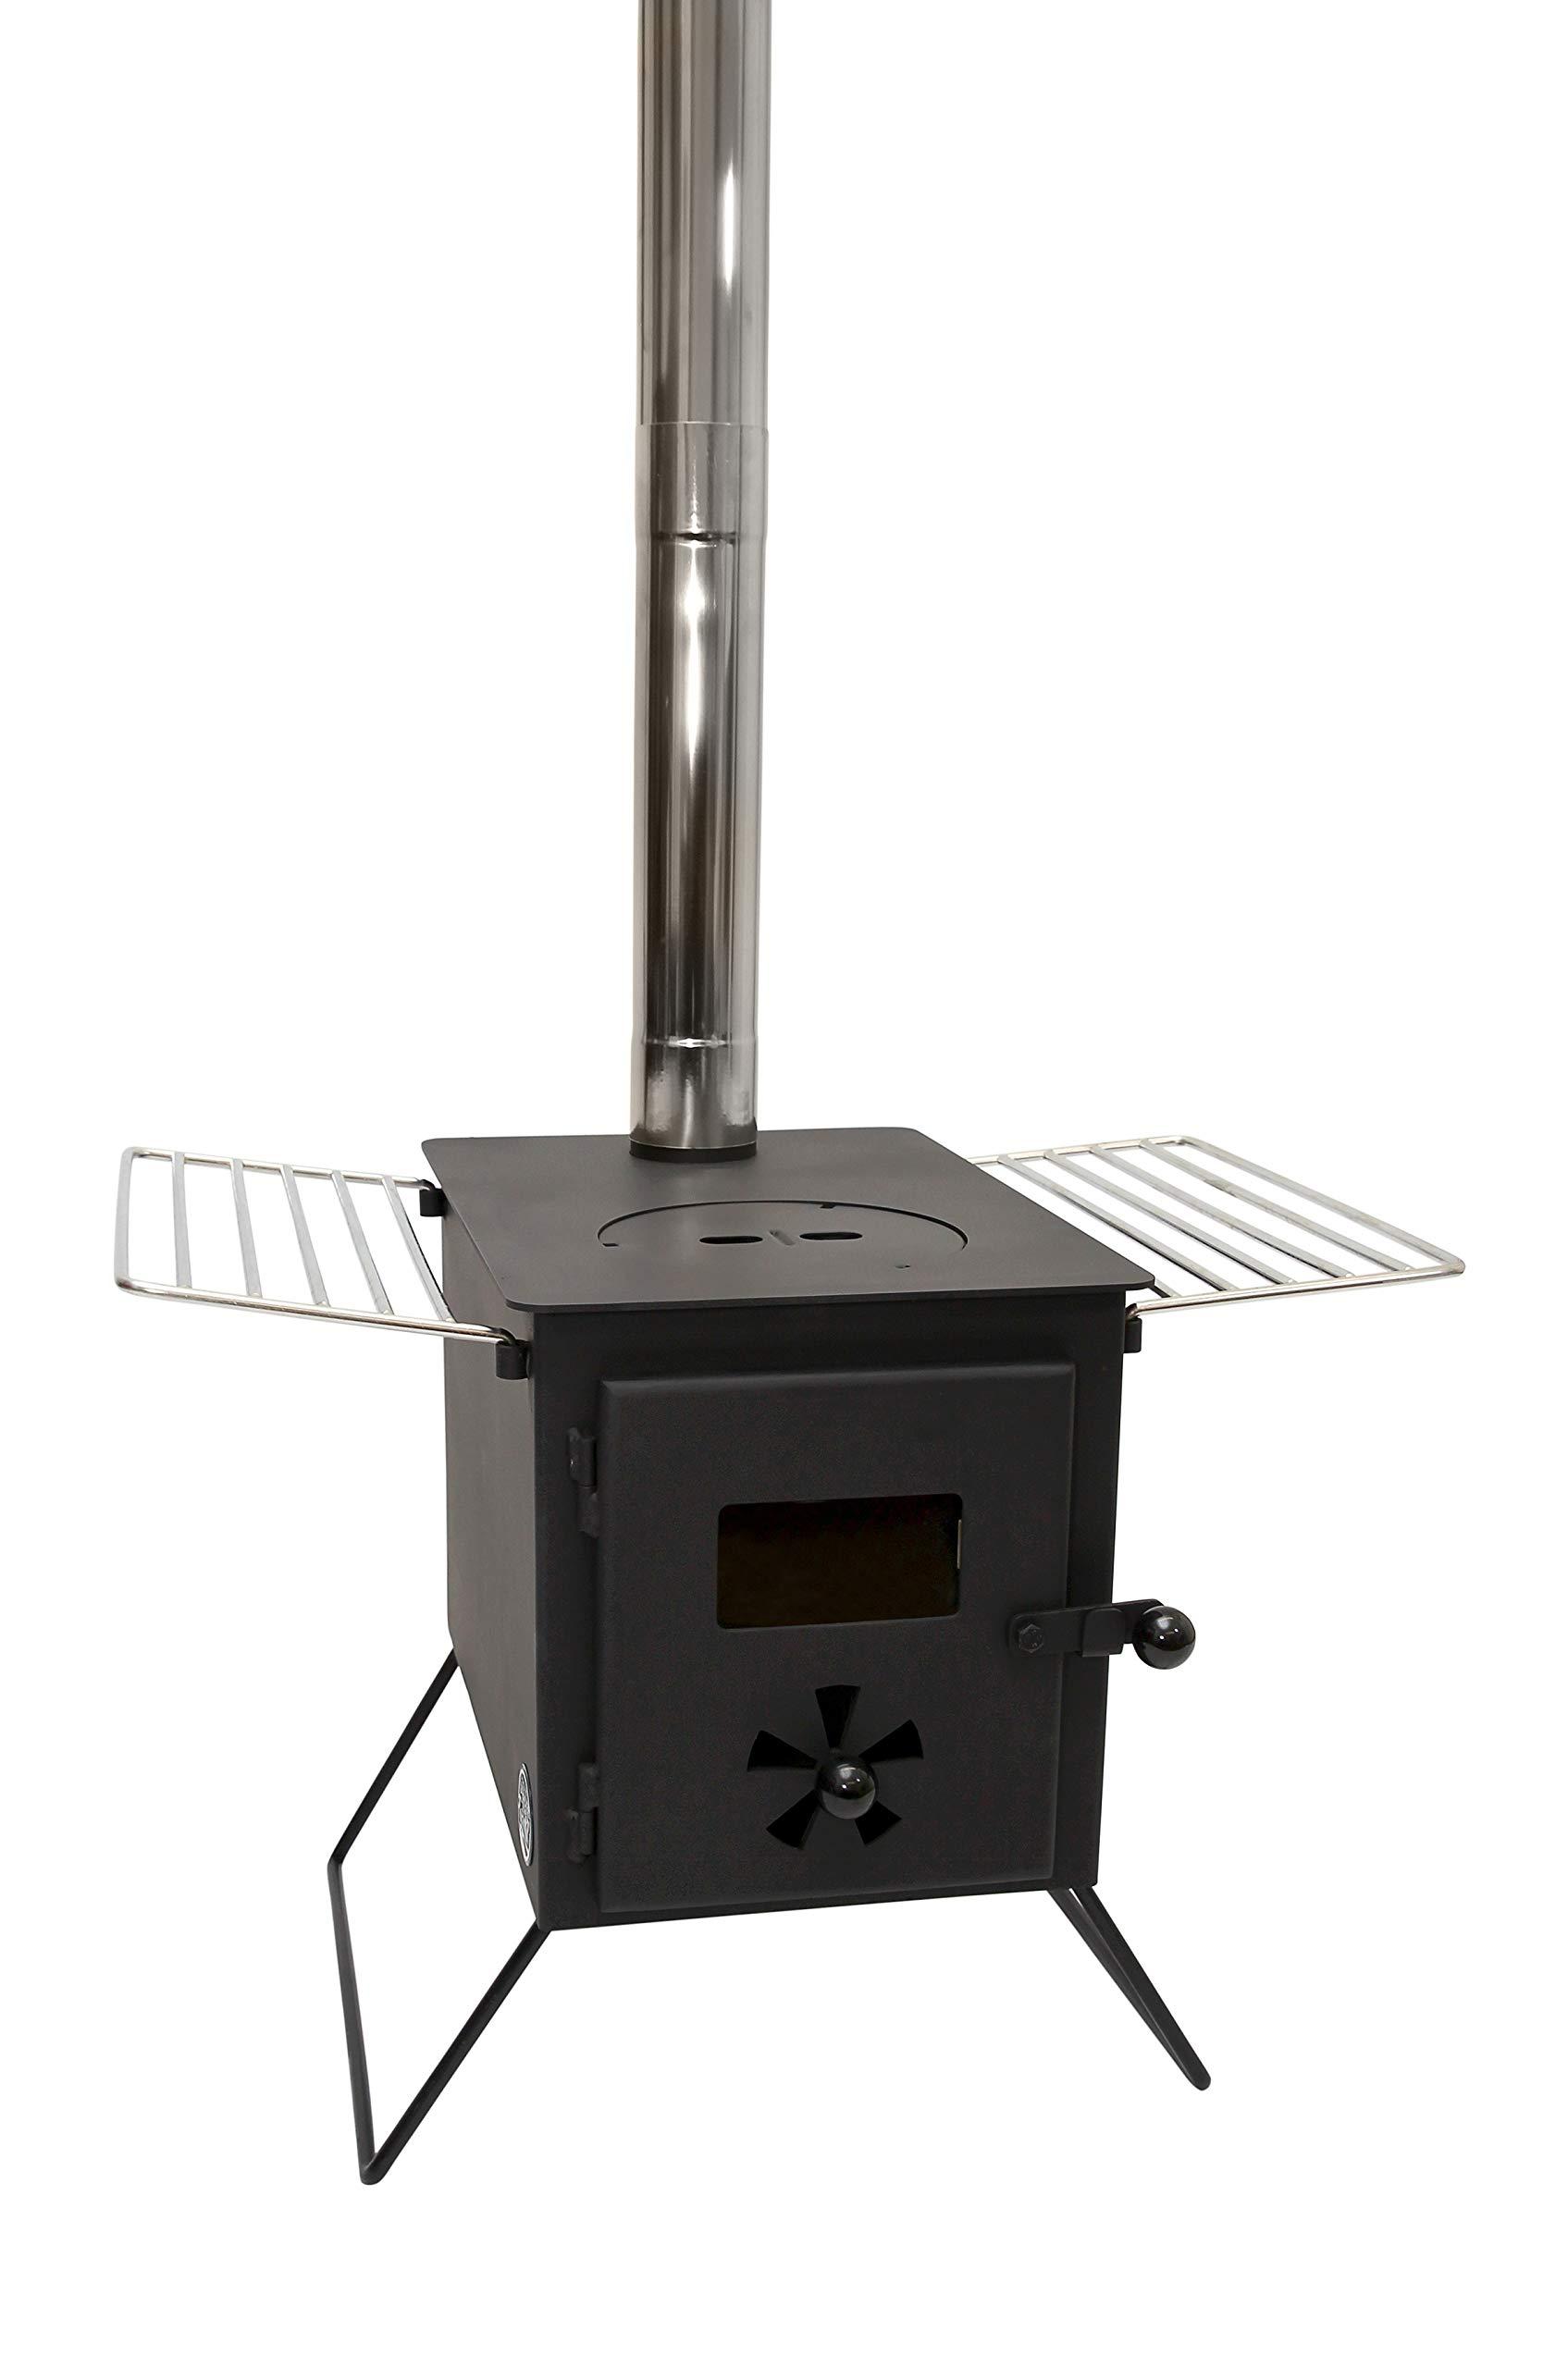 Outbacker 'Firebox' Portable Wood Burning Stove 1